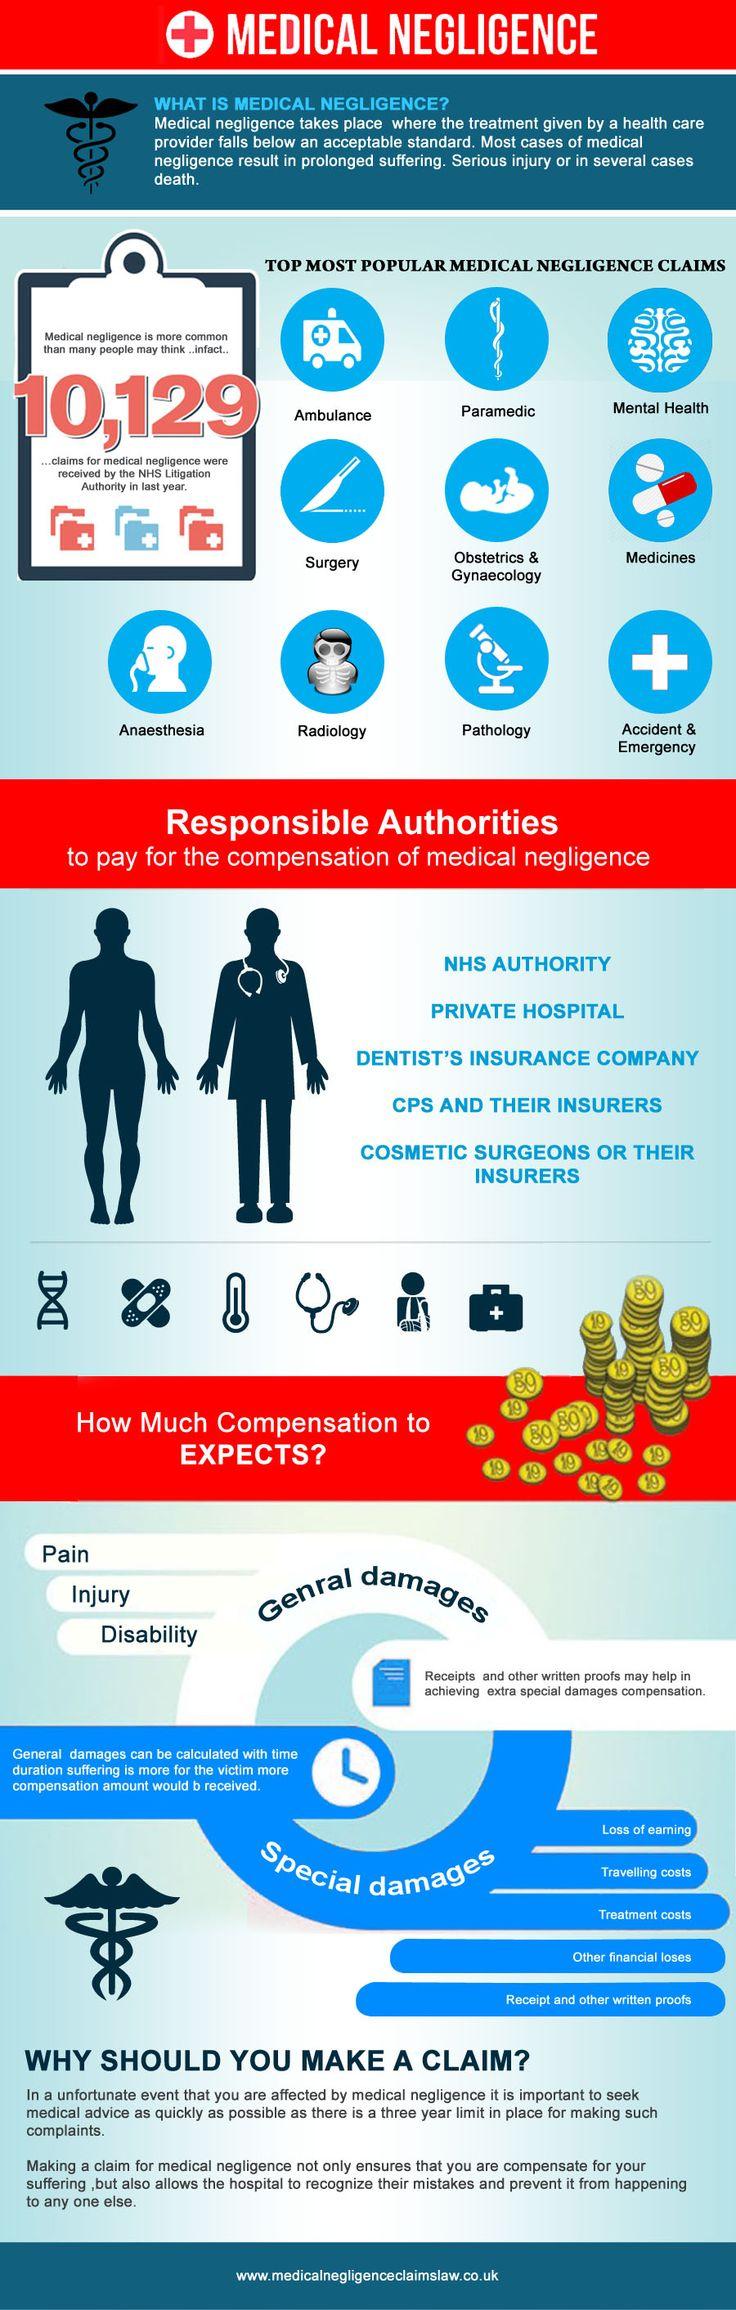 clinical negligence - http://www.medicalnegligencehelpdesk.com ...